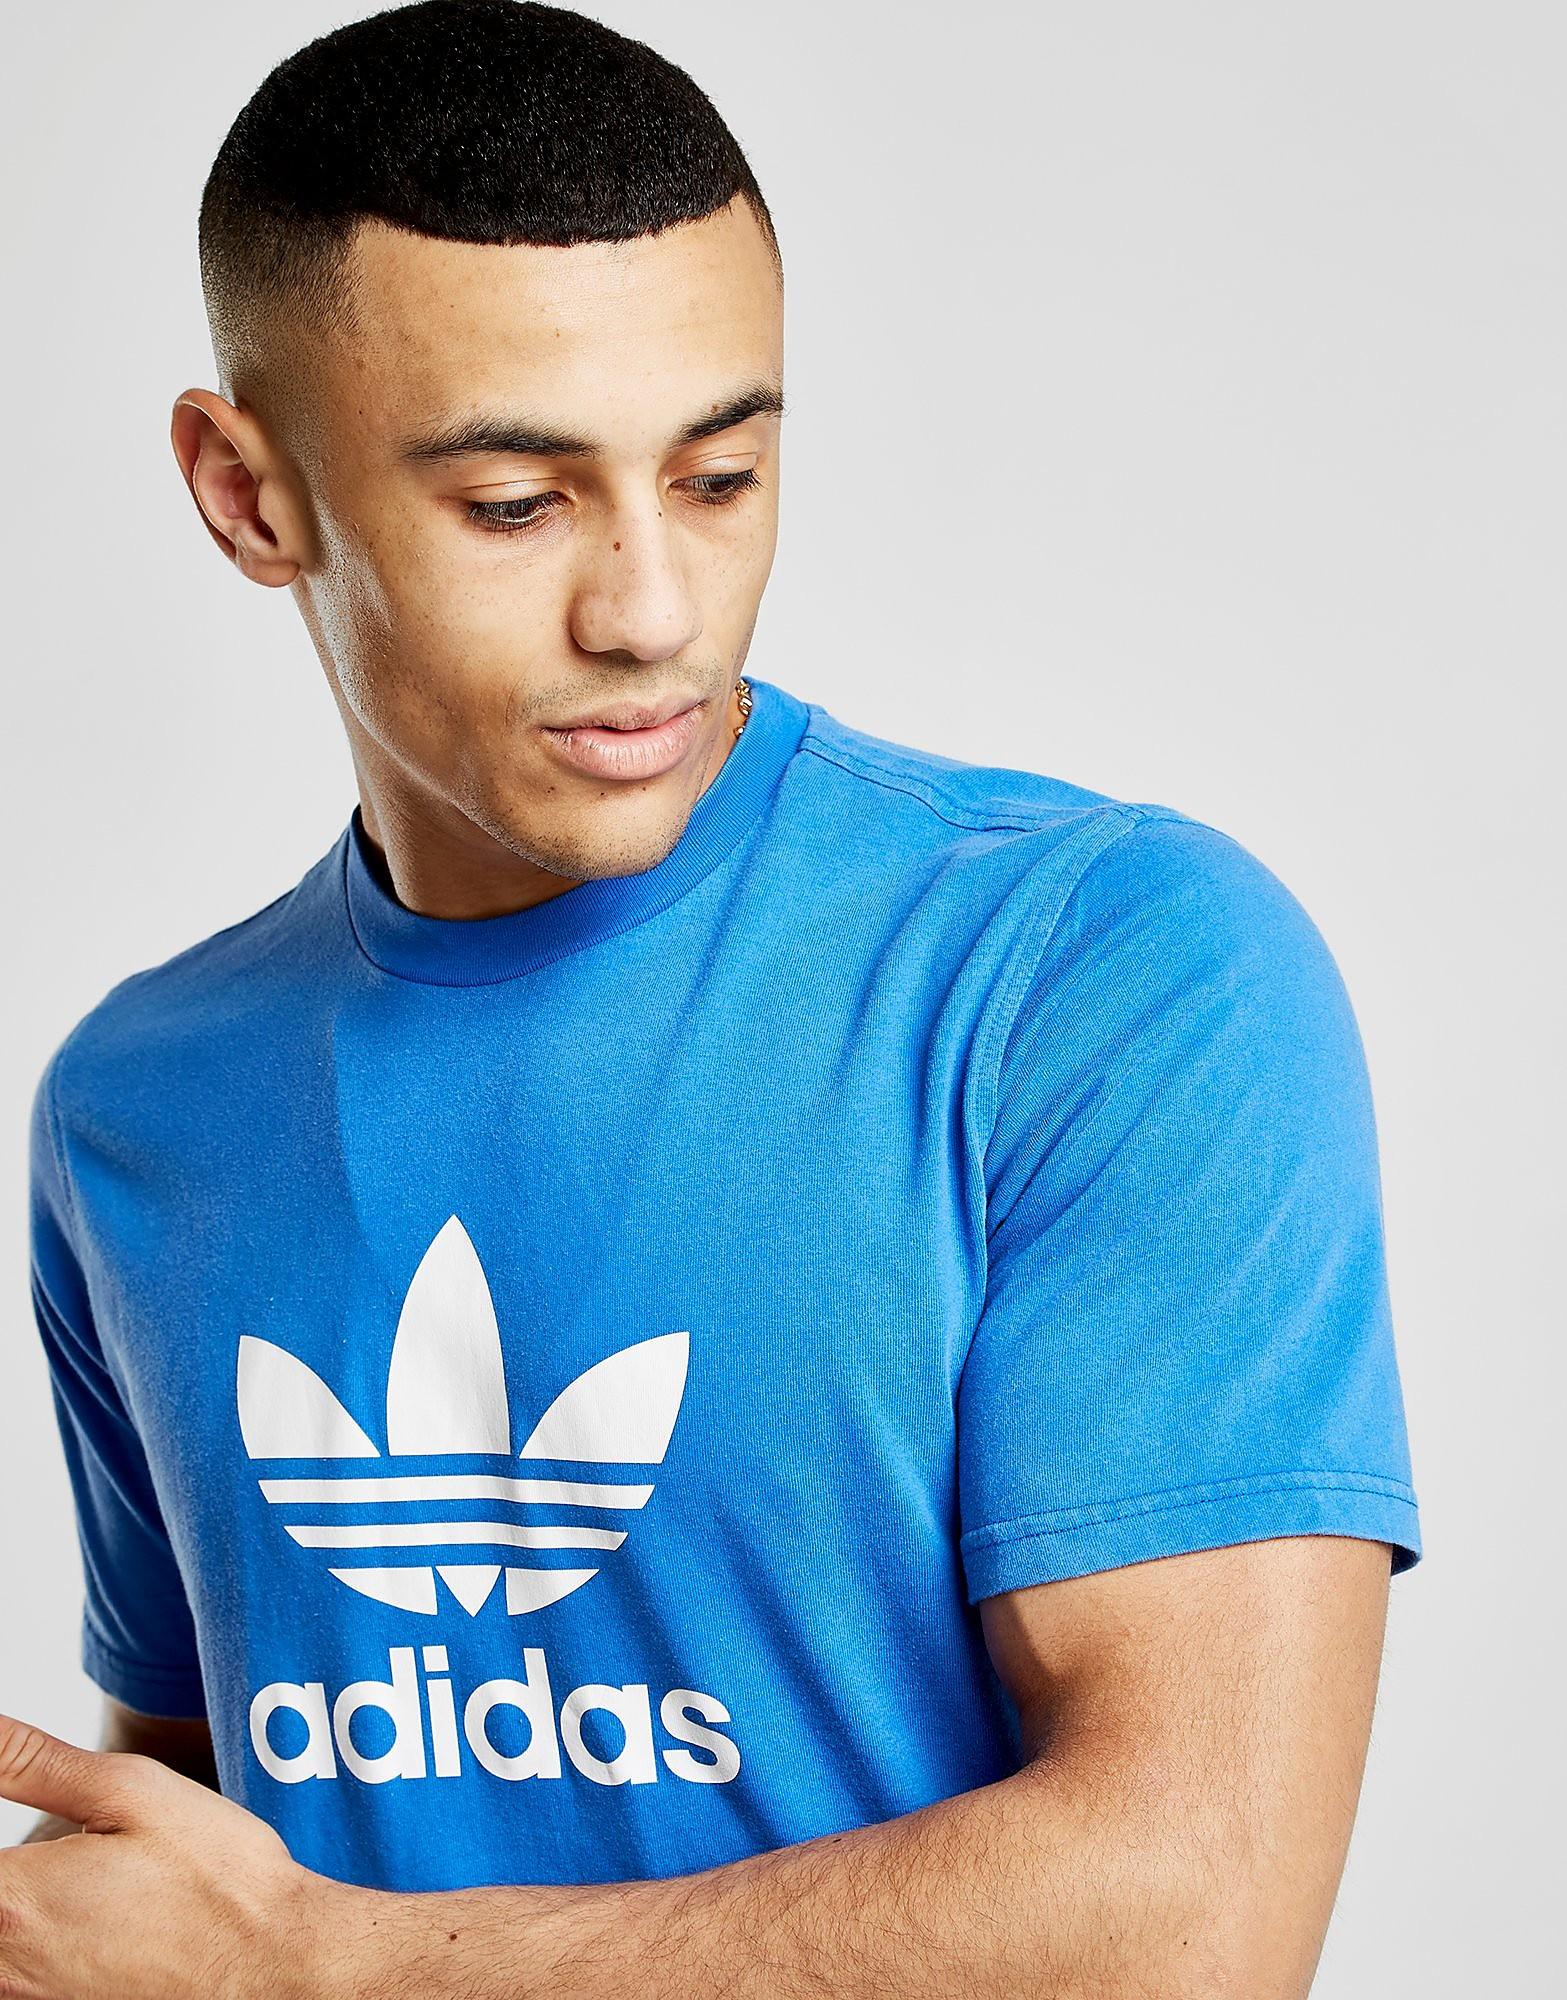 adidas Originals T-shirt Trefoil State Homme